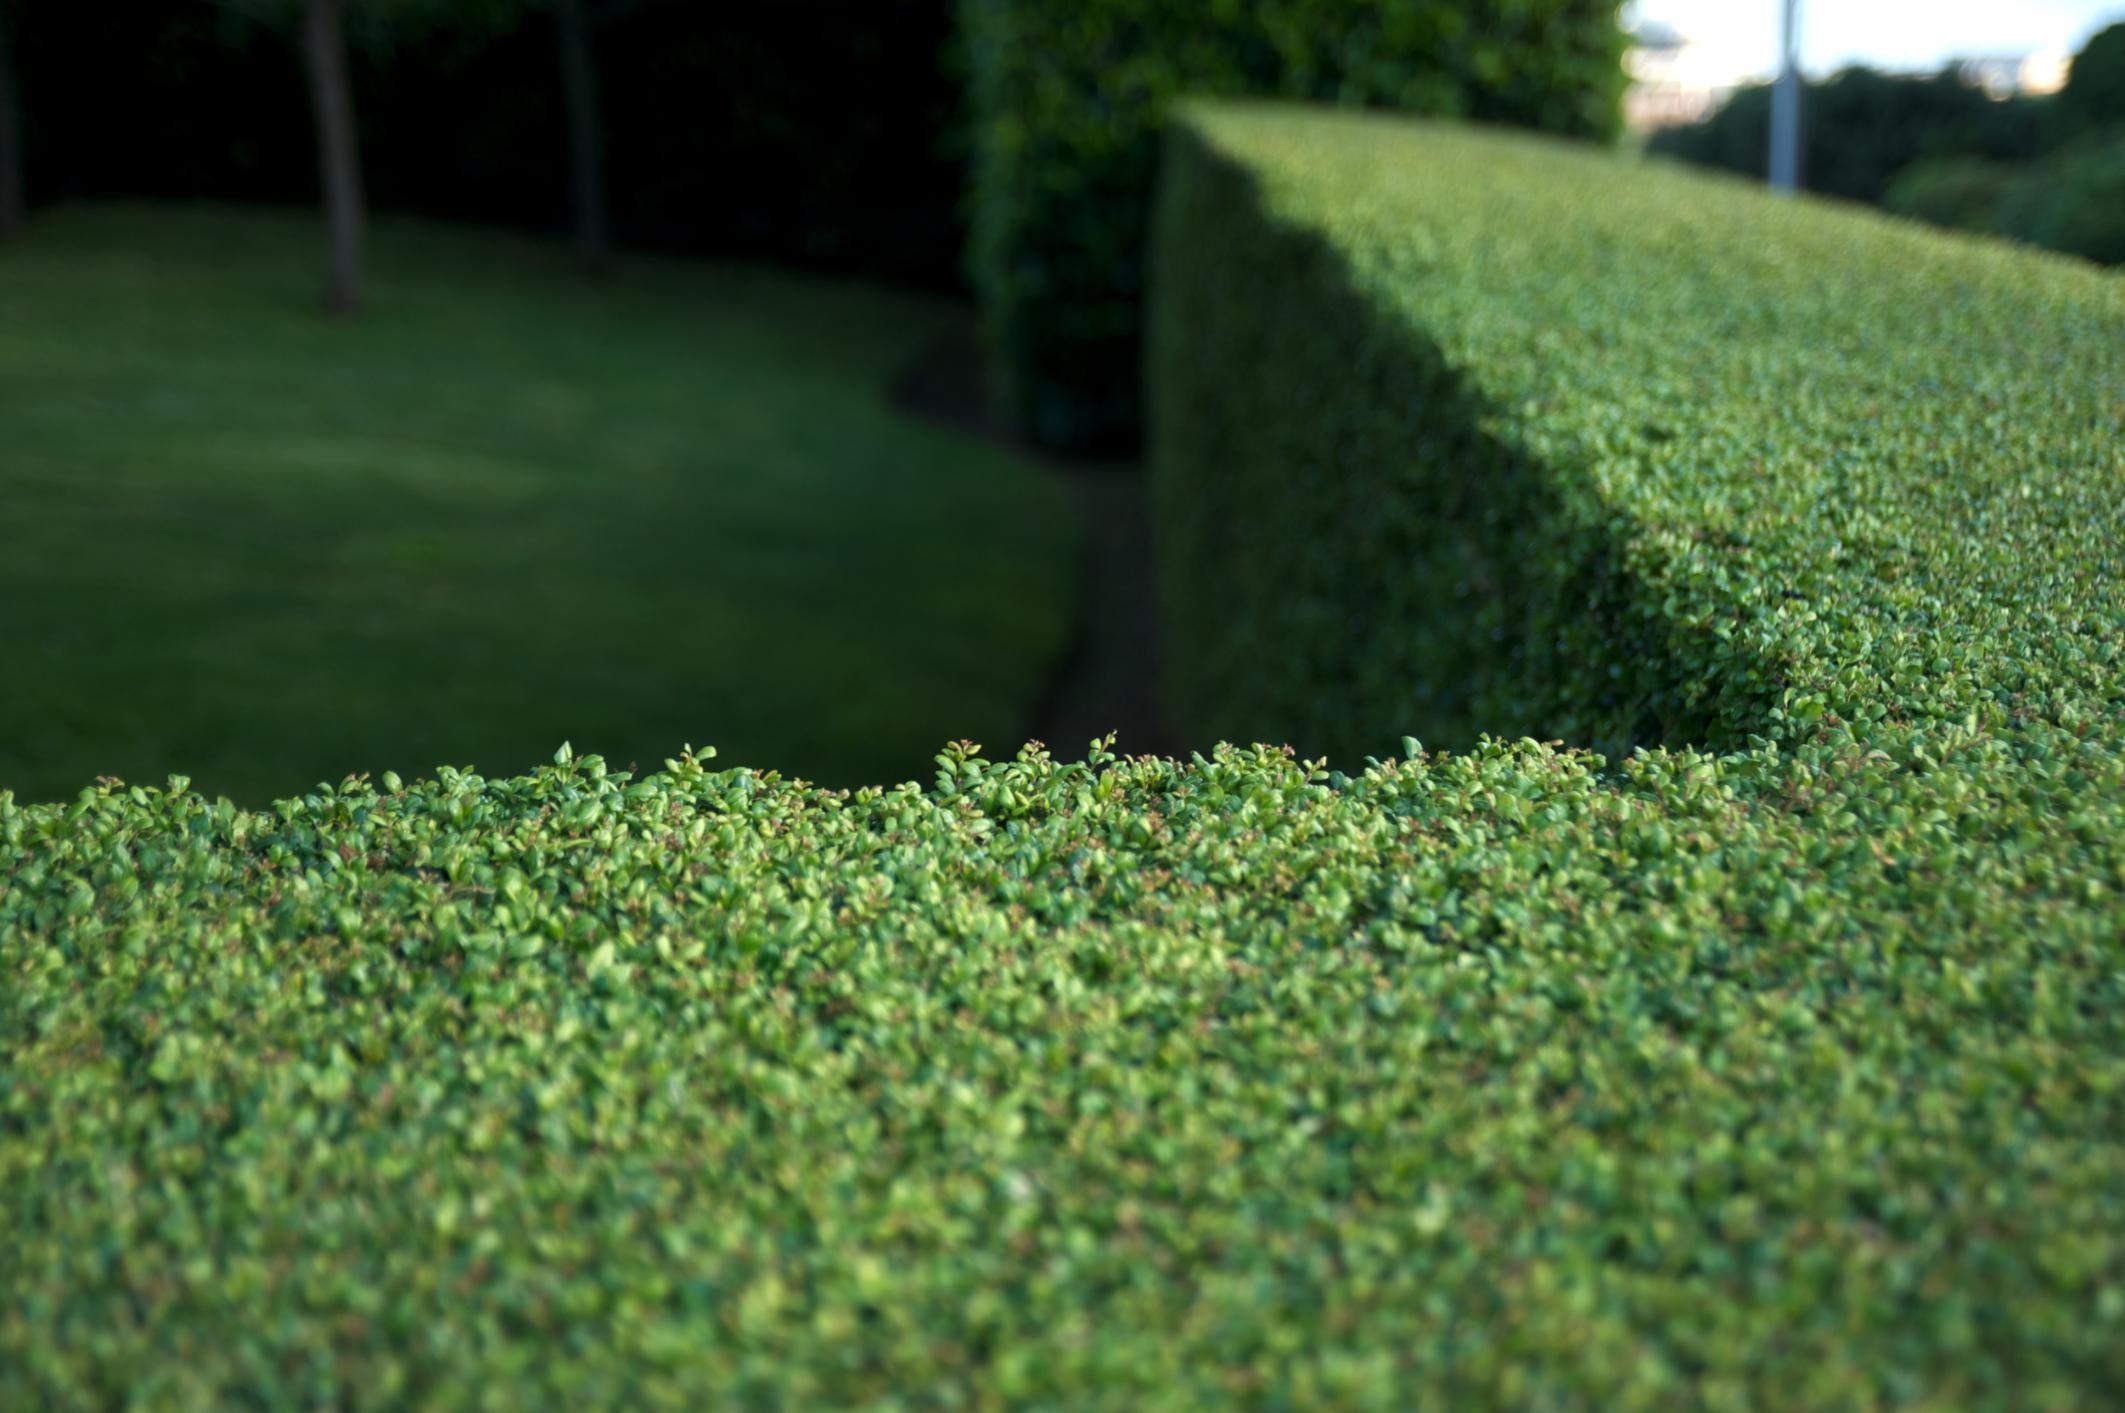 Best shrubs for full sun and privacy - Best Shrubs For Full Sun And Privacy 32